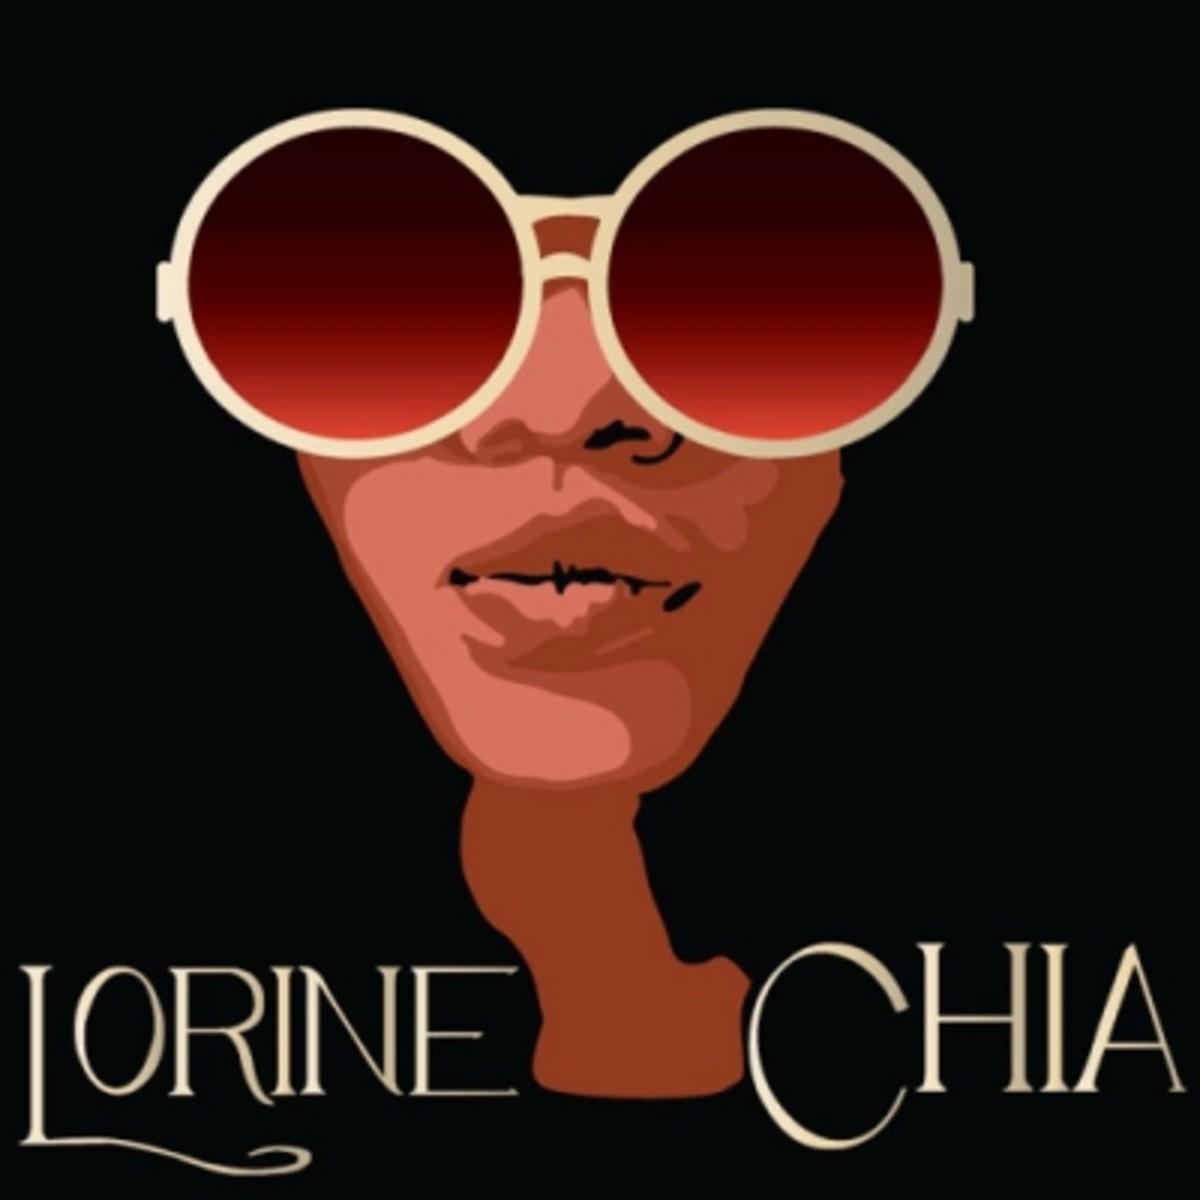 lorine-chia-feeling-like-ive-been-wrong.jpg